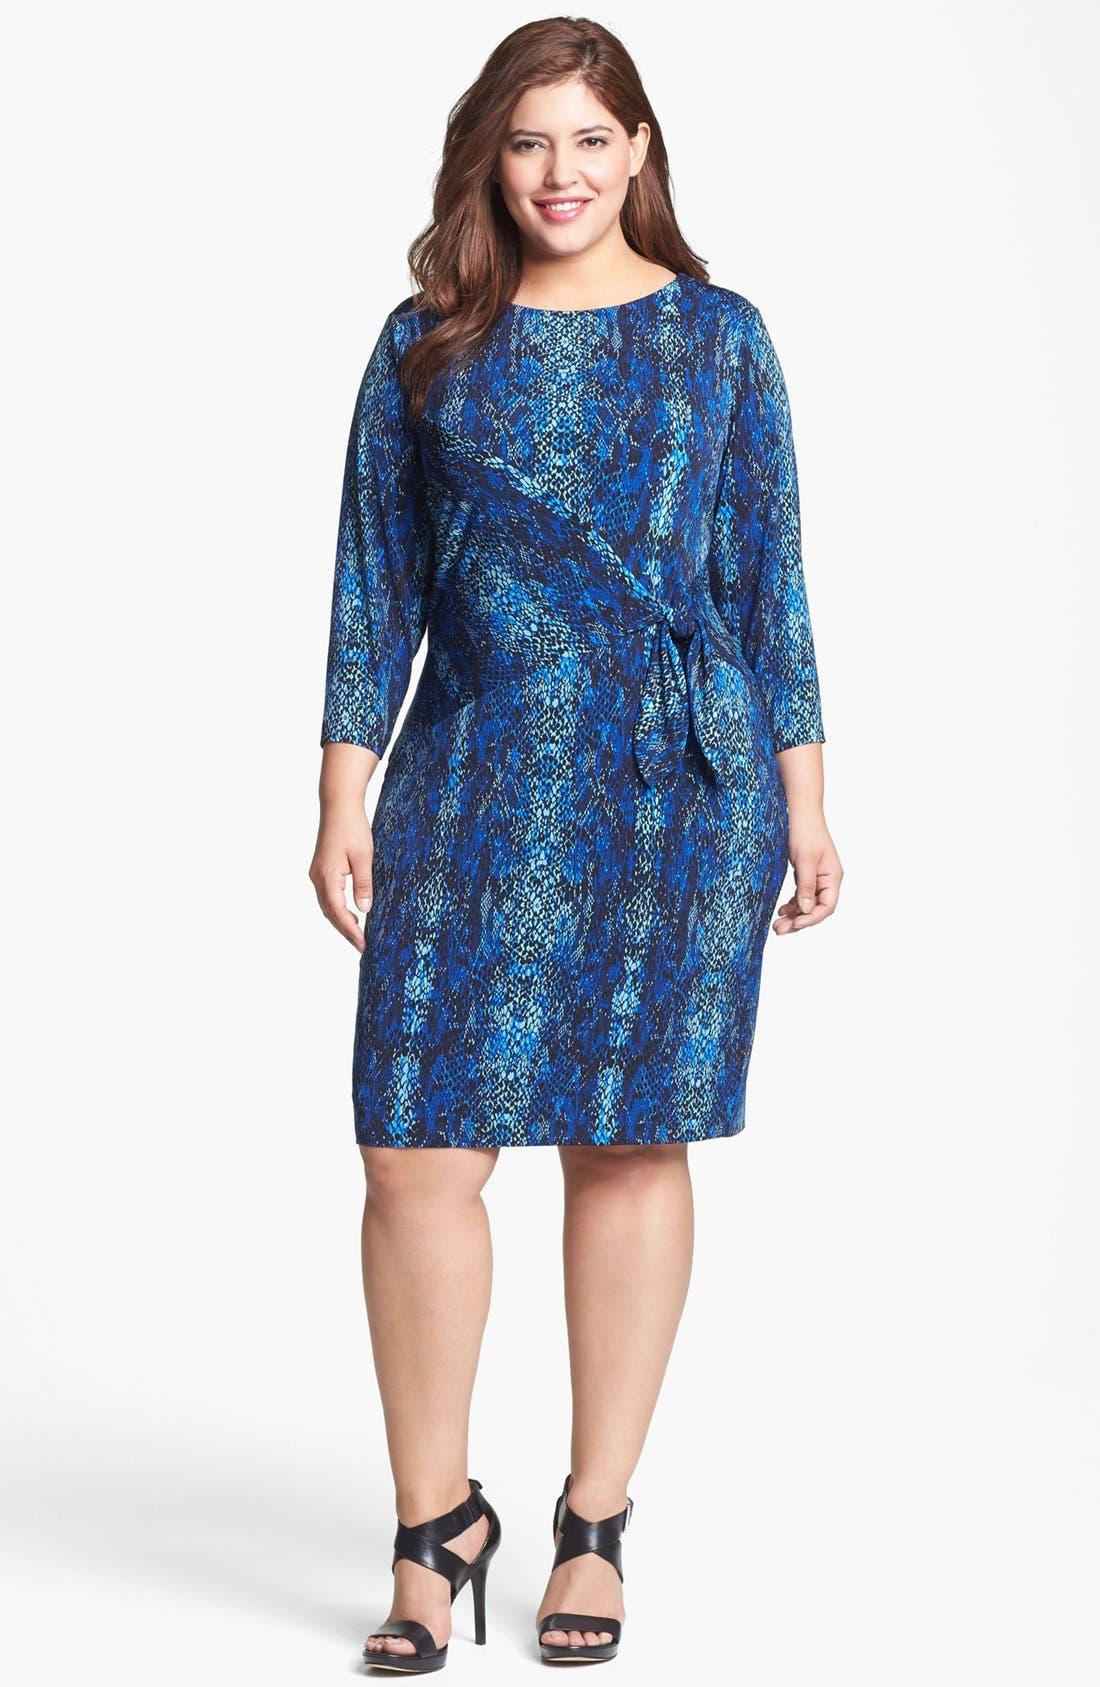 Main Image - Calvin Klein Print Side Tie Sheath Dress (Plus Size)